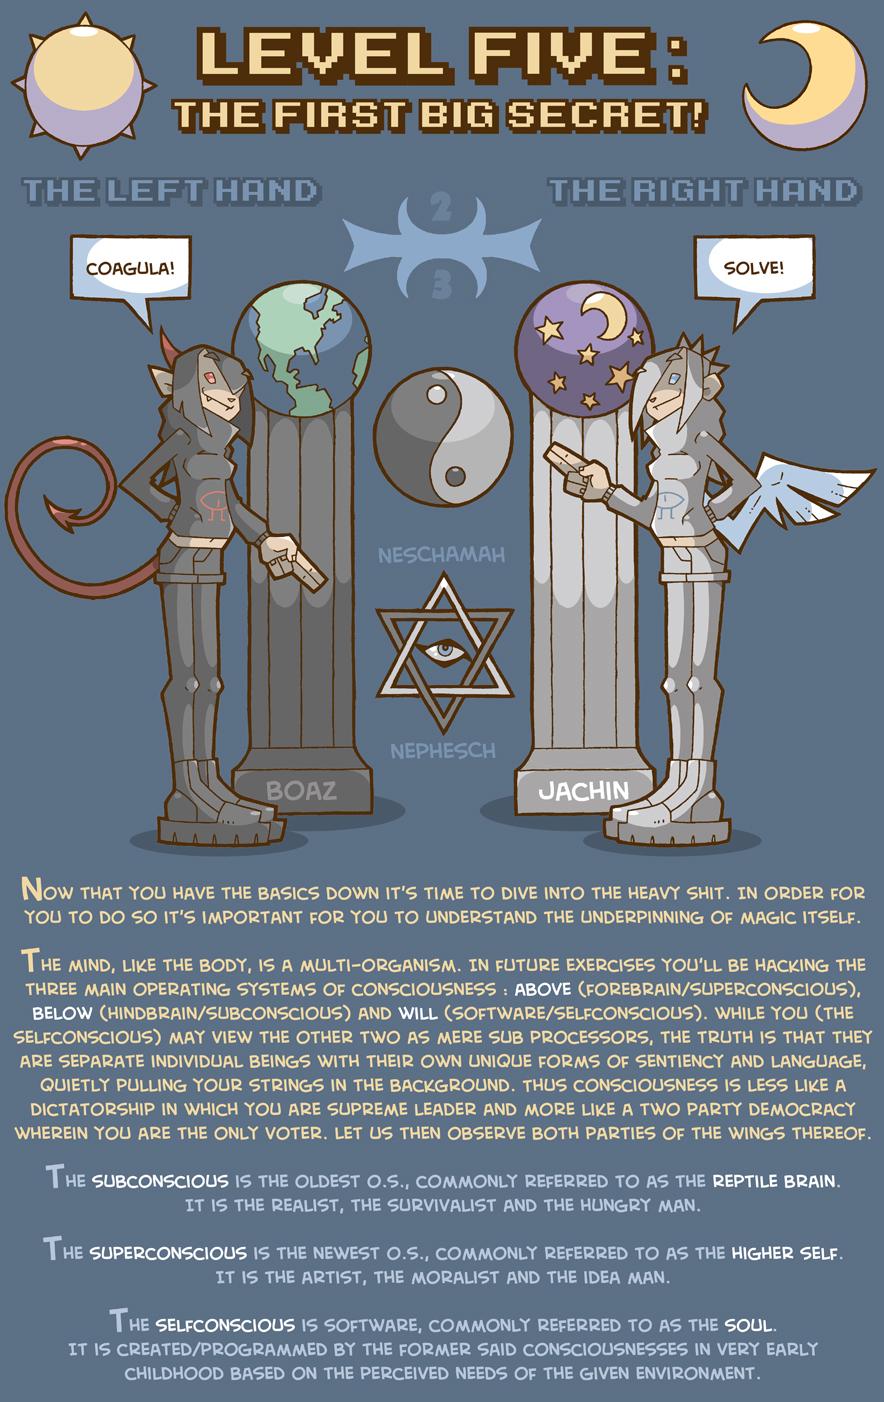 http://fc06.deviantart.net/fs71/f/2015/004/1/c/psychonaut_field_manual_page_7_by_bluefluke-d8cokh3.jpg